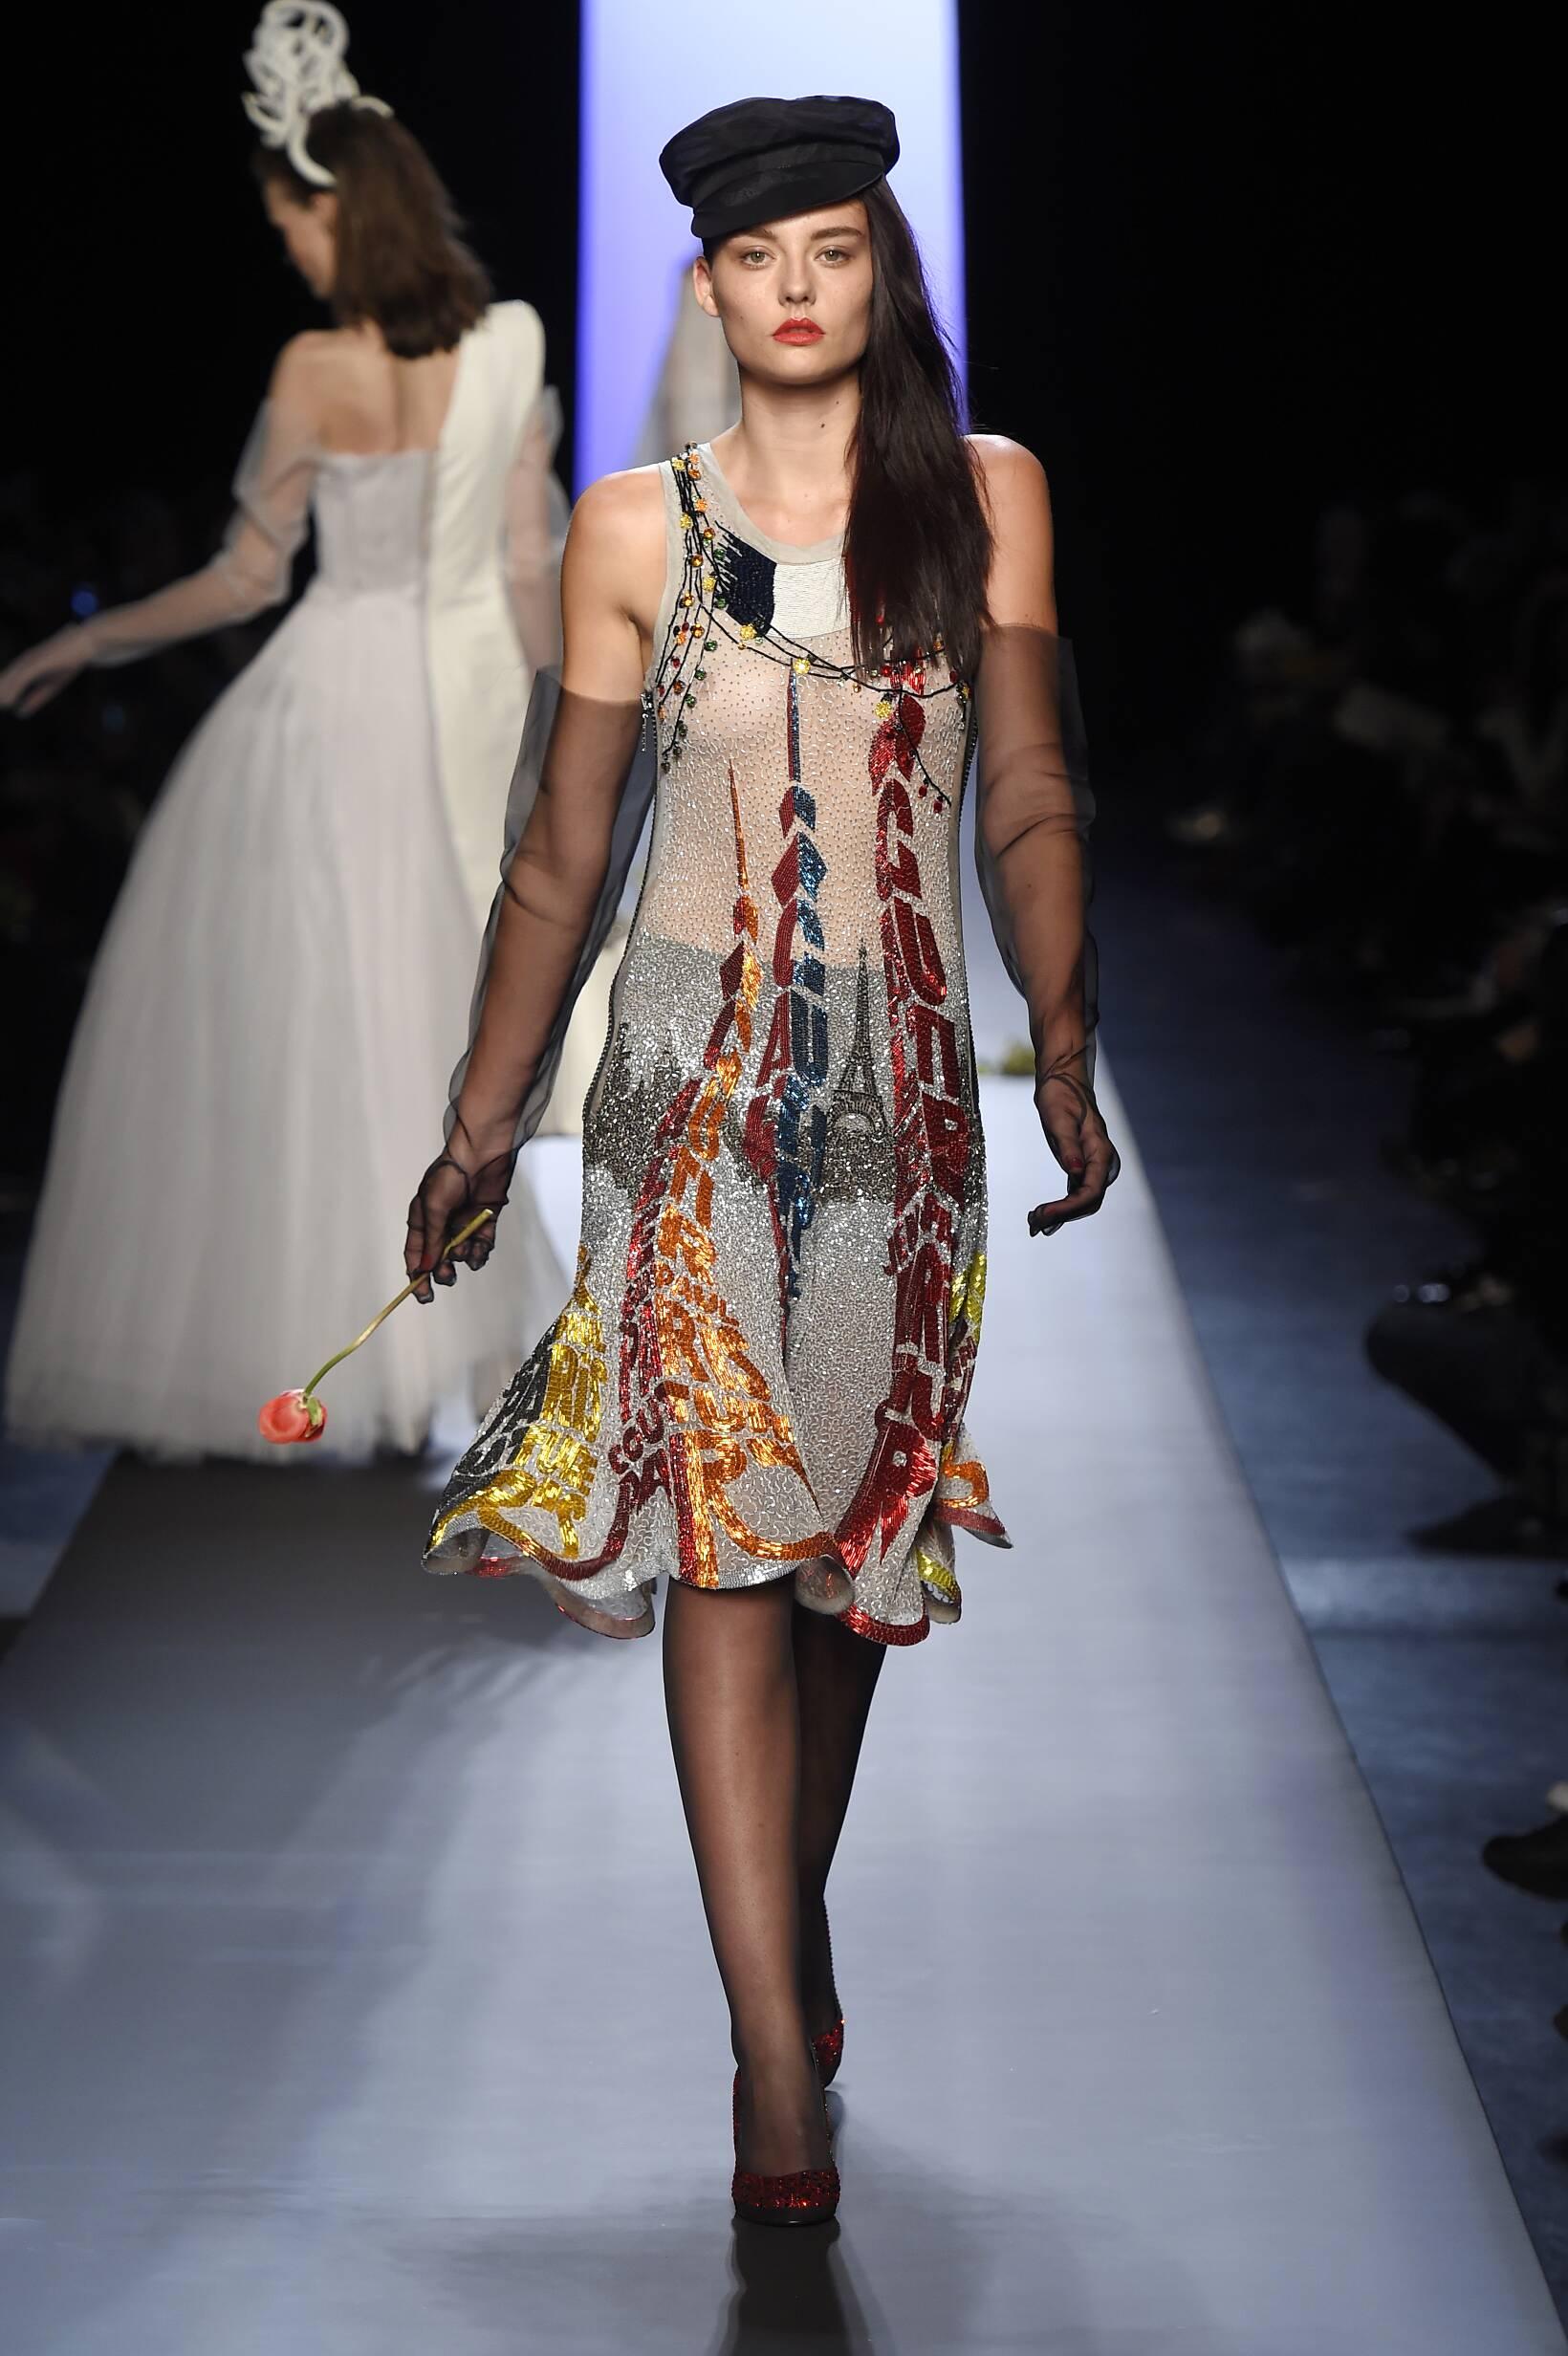 Fashion Summer Trends 2015 Jean Paul Gaultier Haute Couture